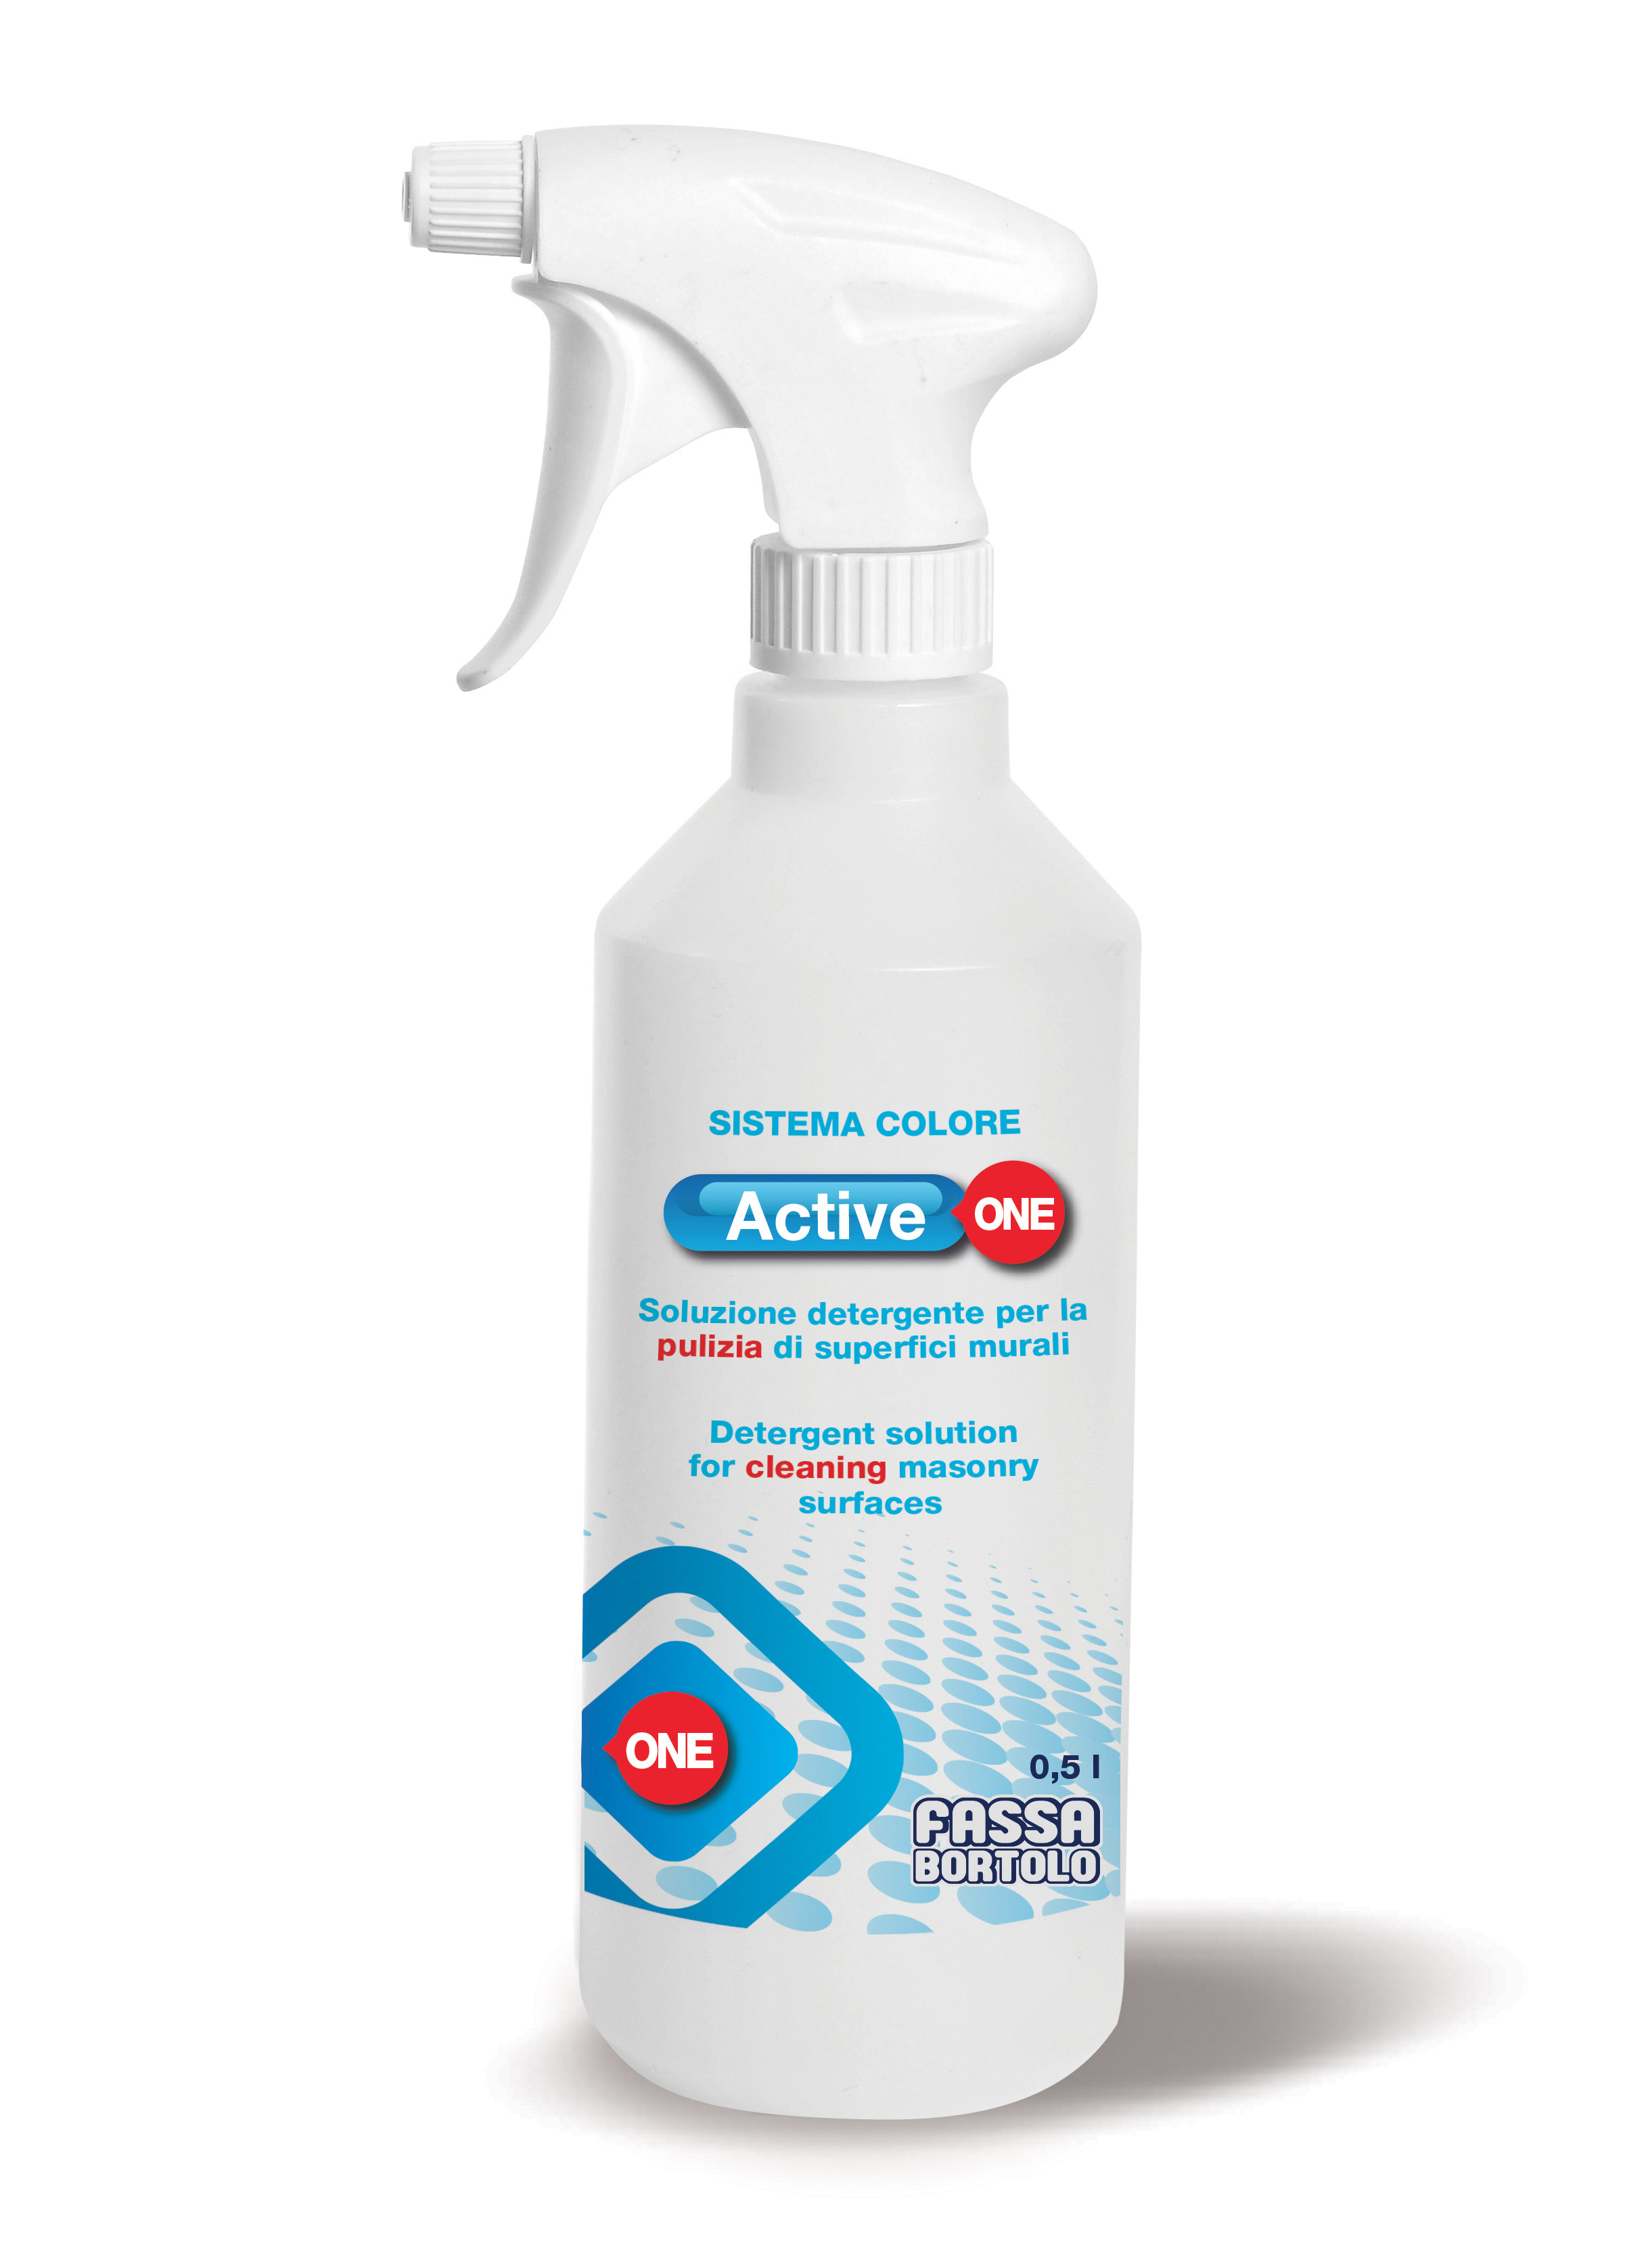 ACTIVE ONE: Soluzione detergente per la pulizia di superfici murali